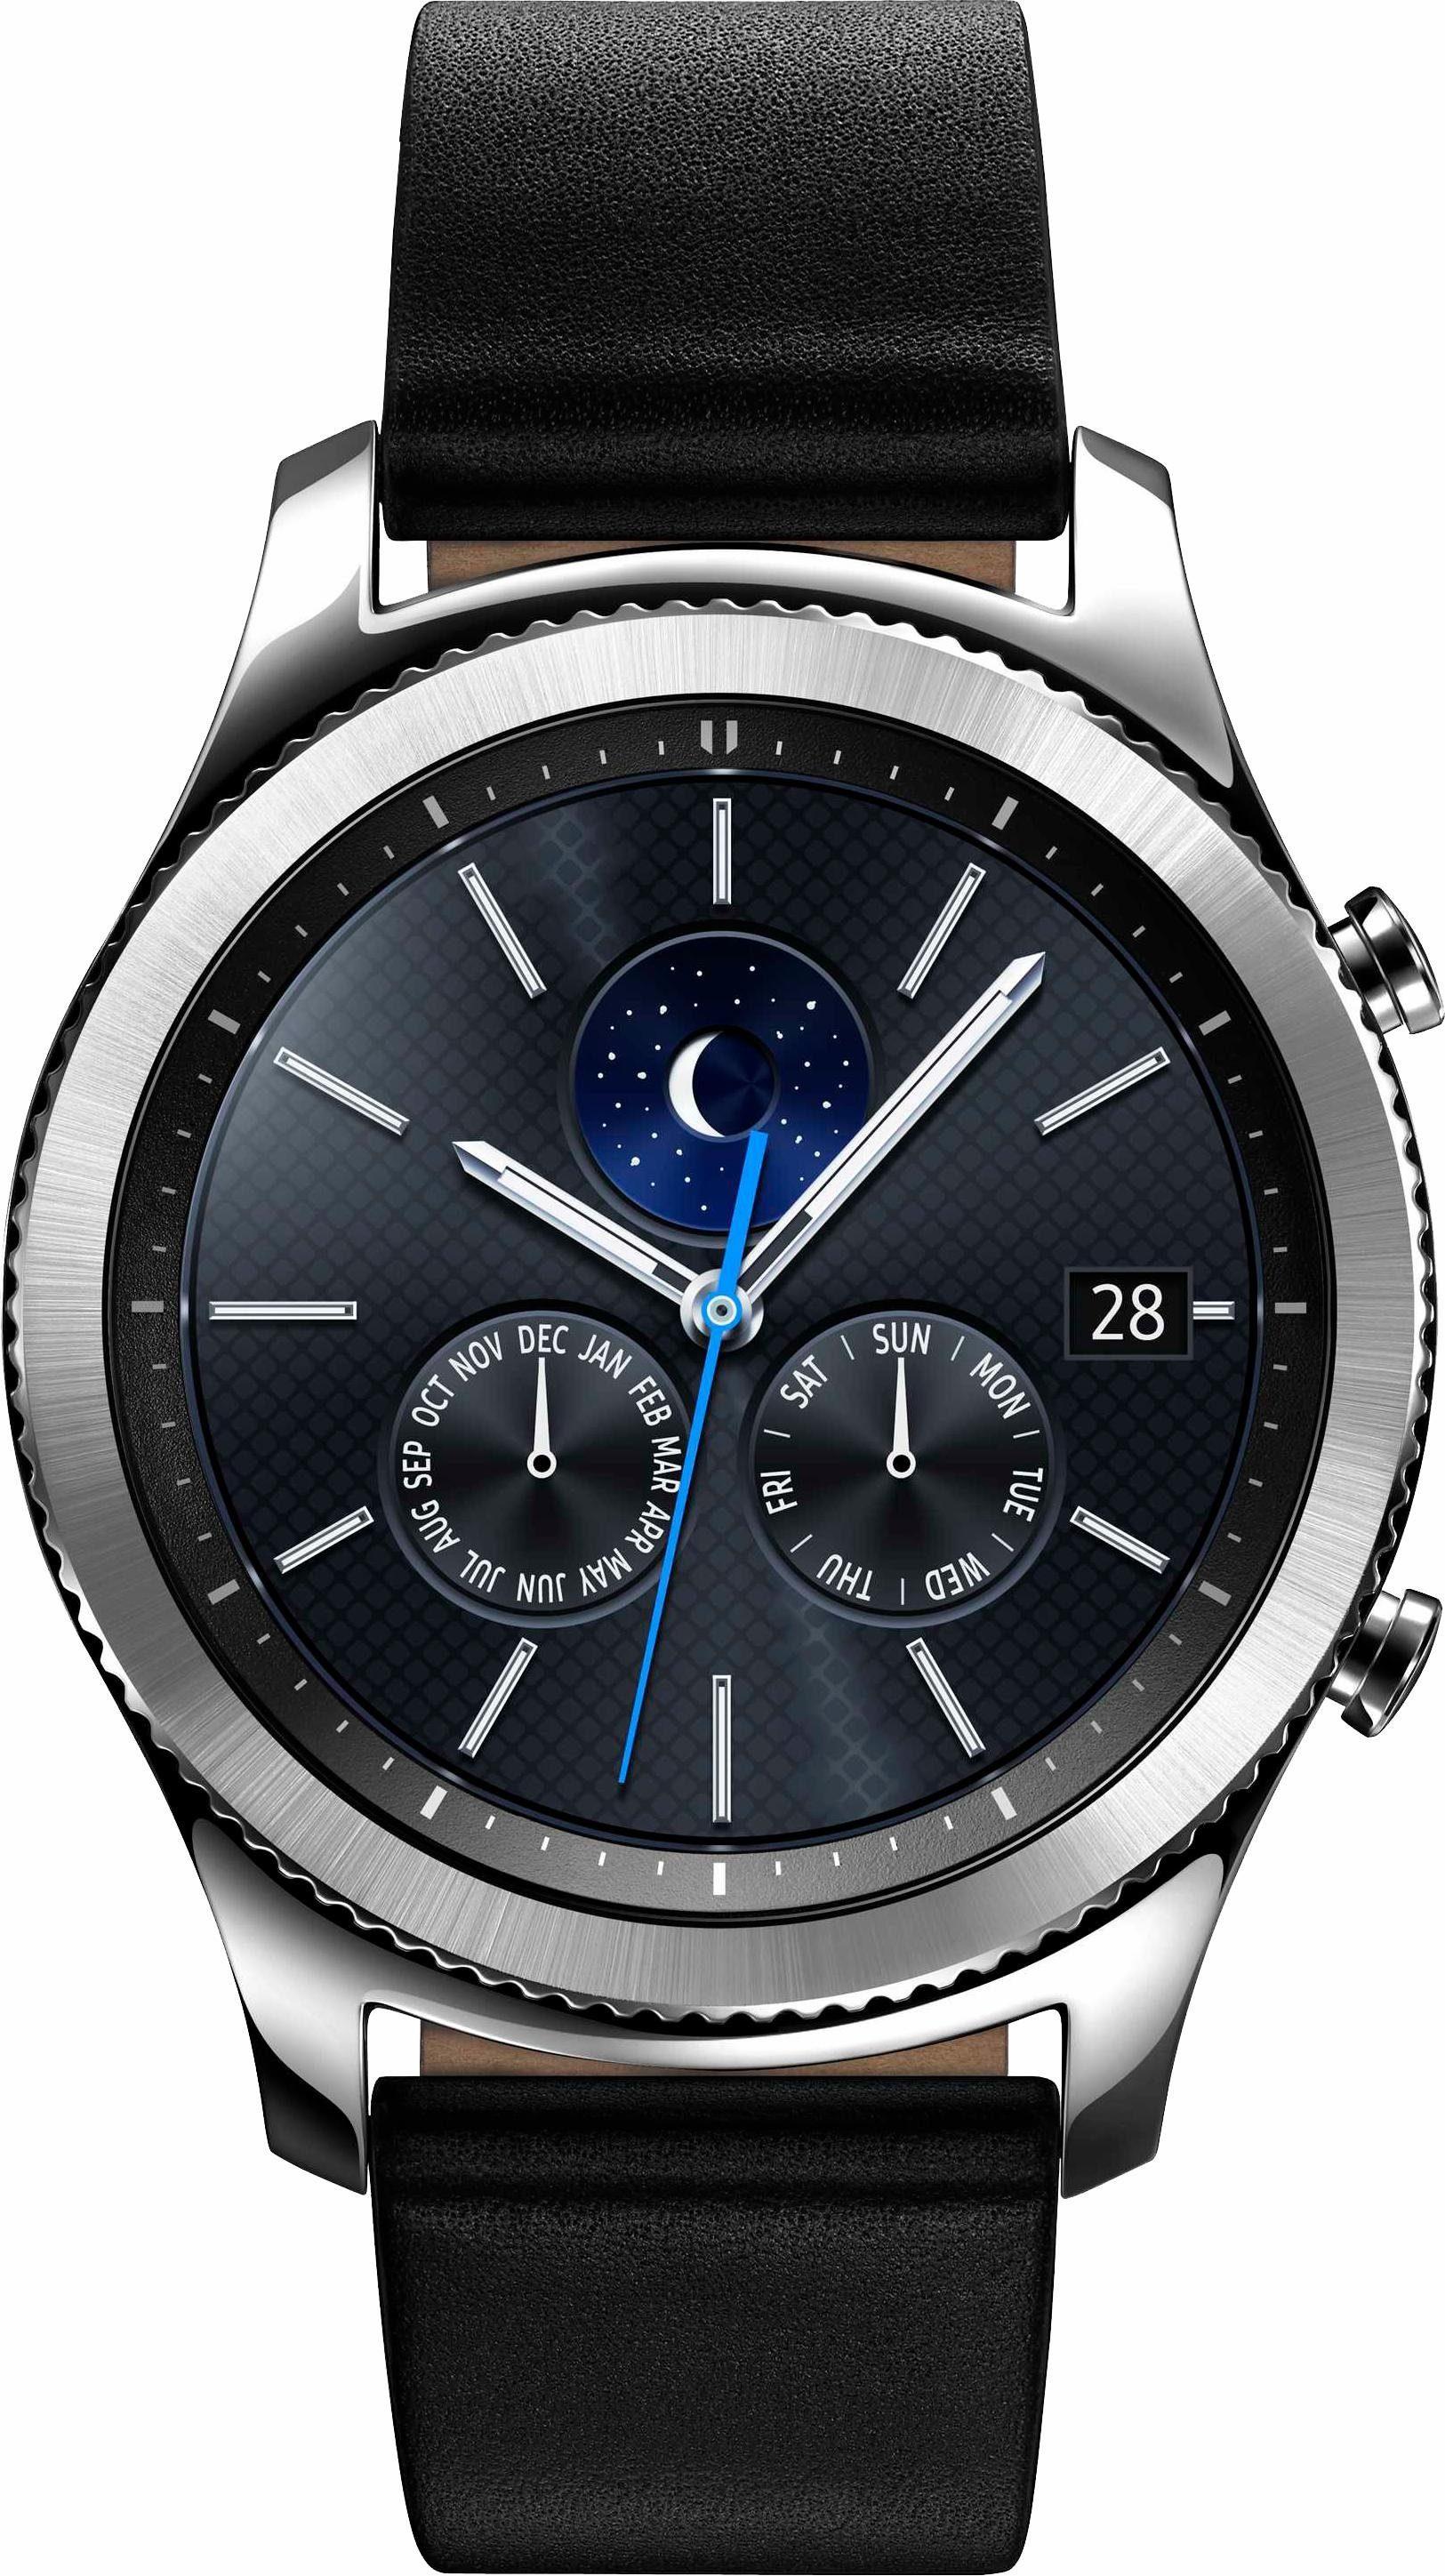 Samsung Gear S3 classic Smartwatch, Tizen, 3,3 cm (1,3 Zoll) Super AMOLED-Touchscreen Display